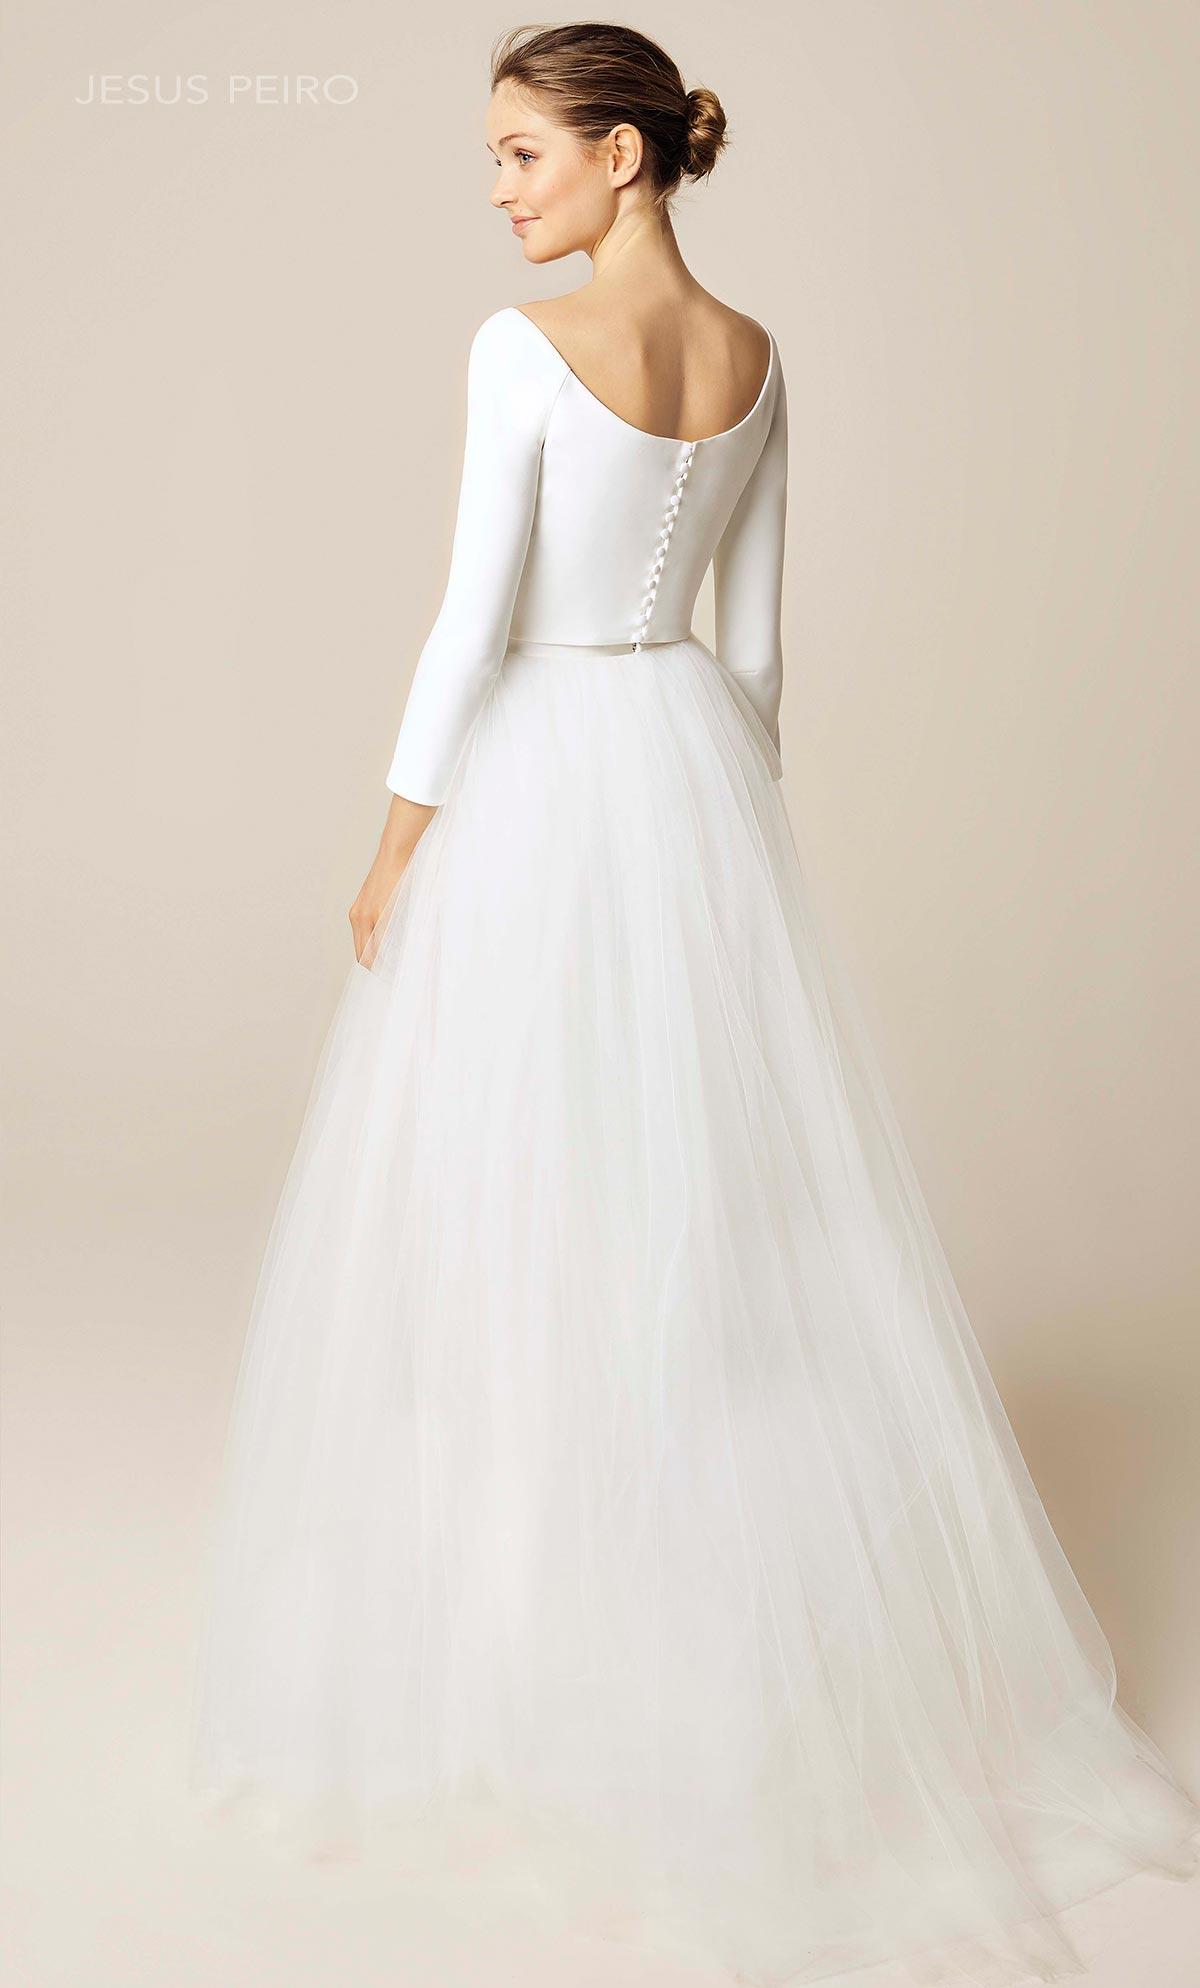 Vestido novia Jesús Peiró Ref.924